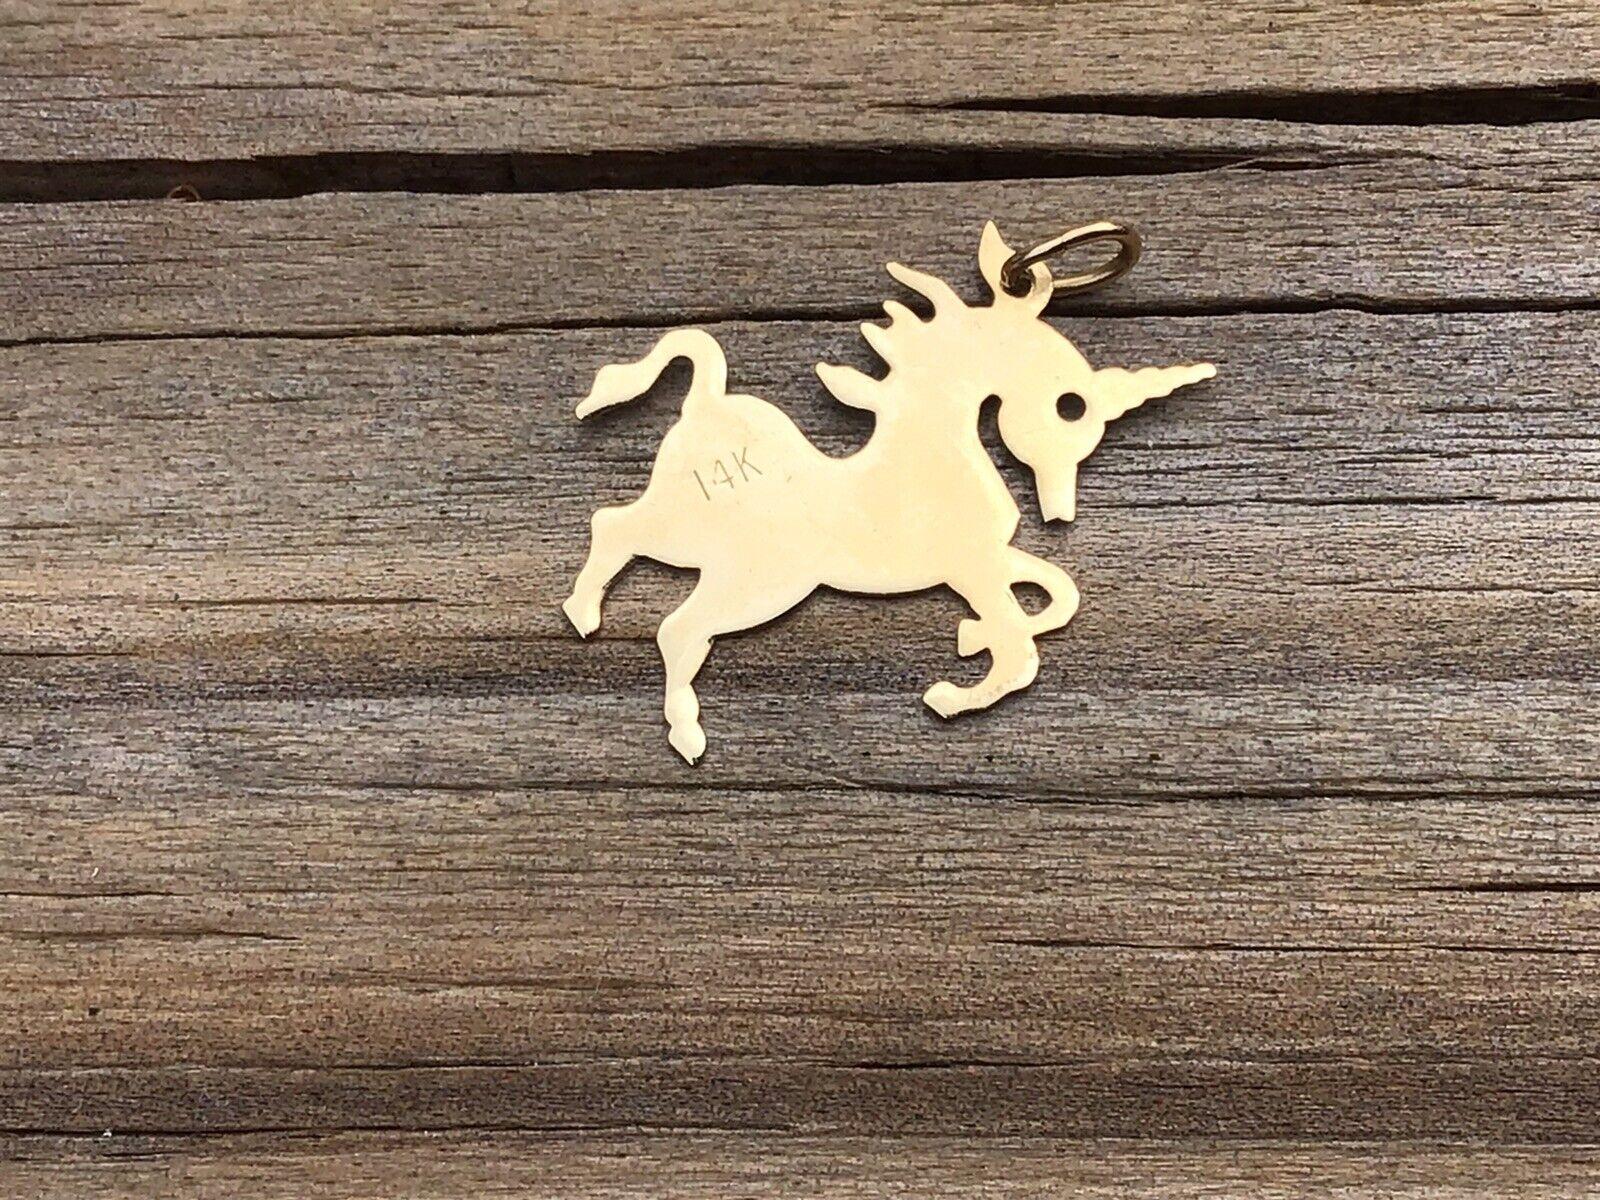 Vintage Unicorn 14k Gold Necklace Pendant/ Charm - image 4